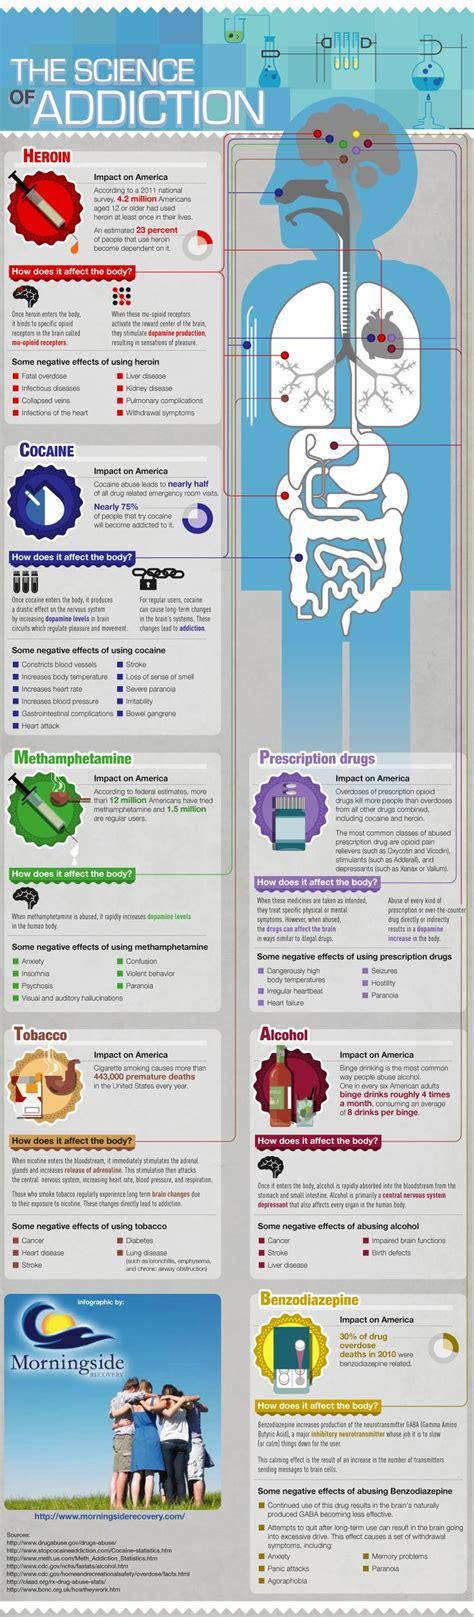 Magnificent Drug Brochure Template Photo - Resume Ideas - namanasa.com